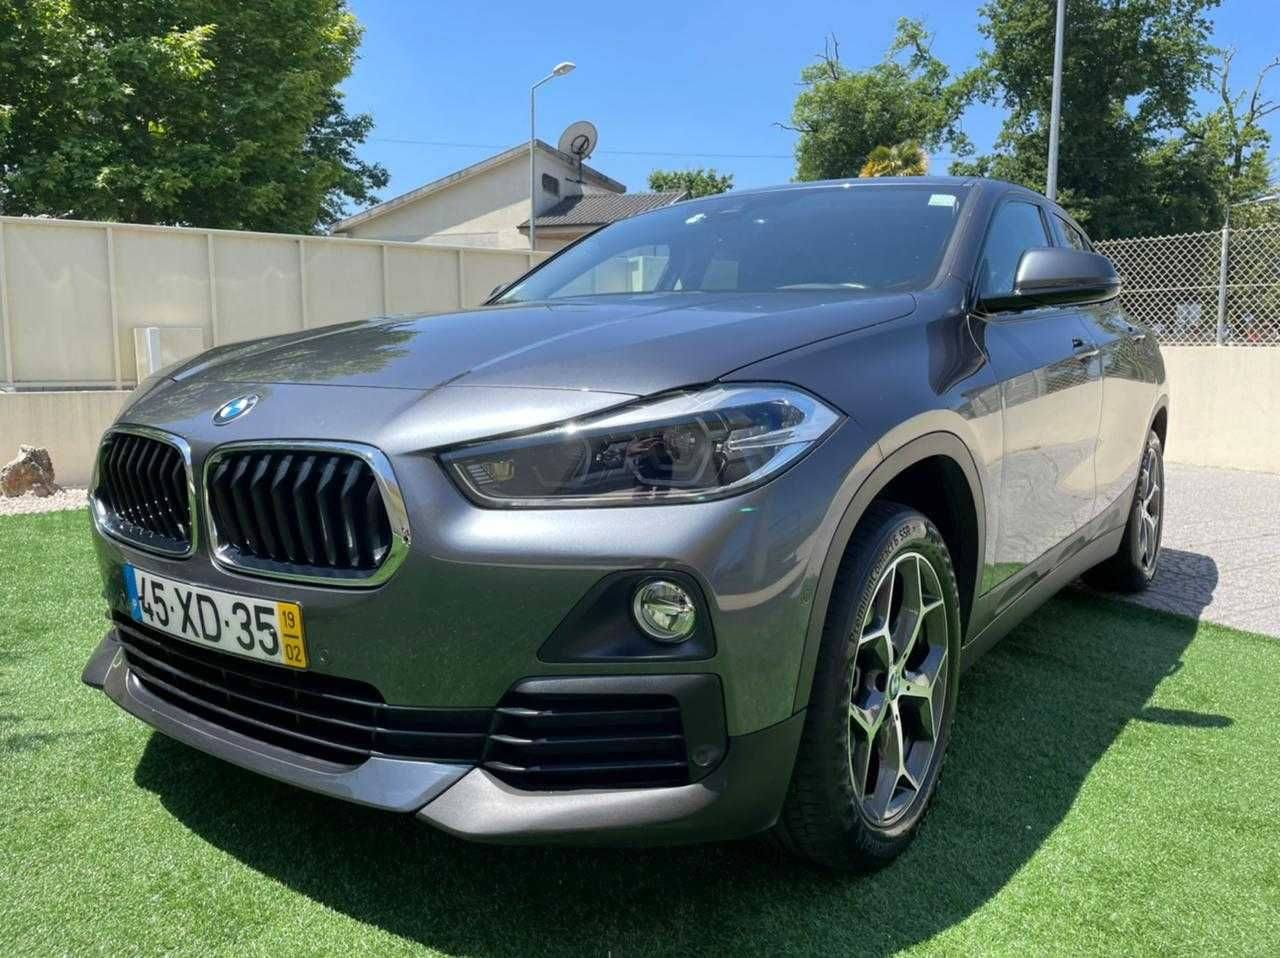 BMW X2 - Oportunidade